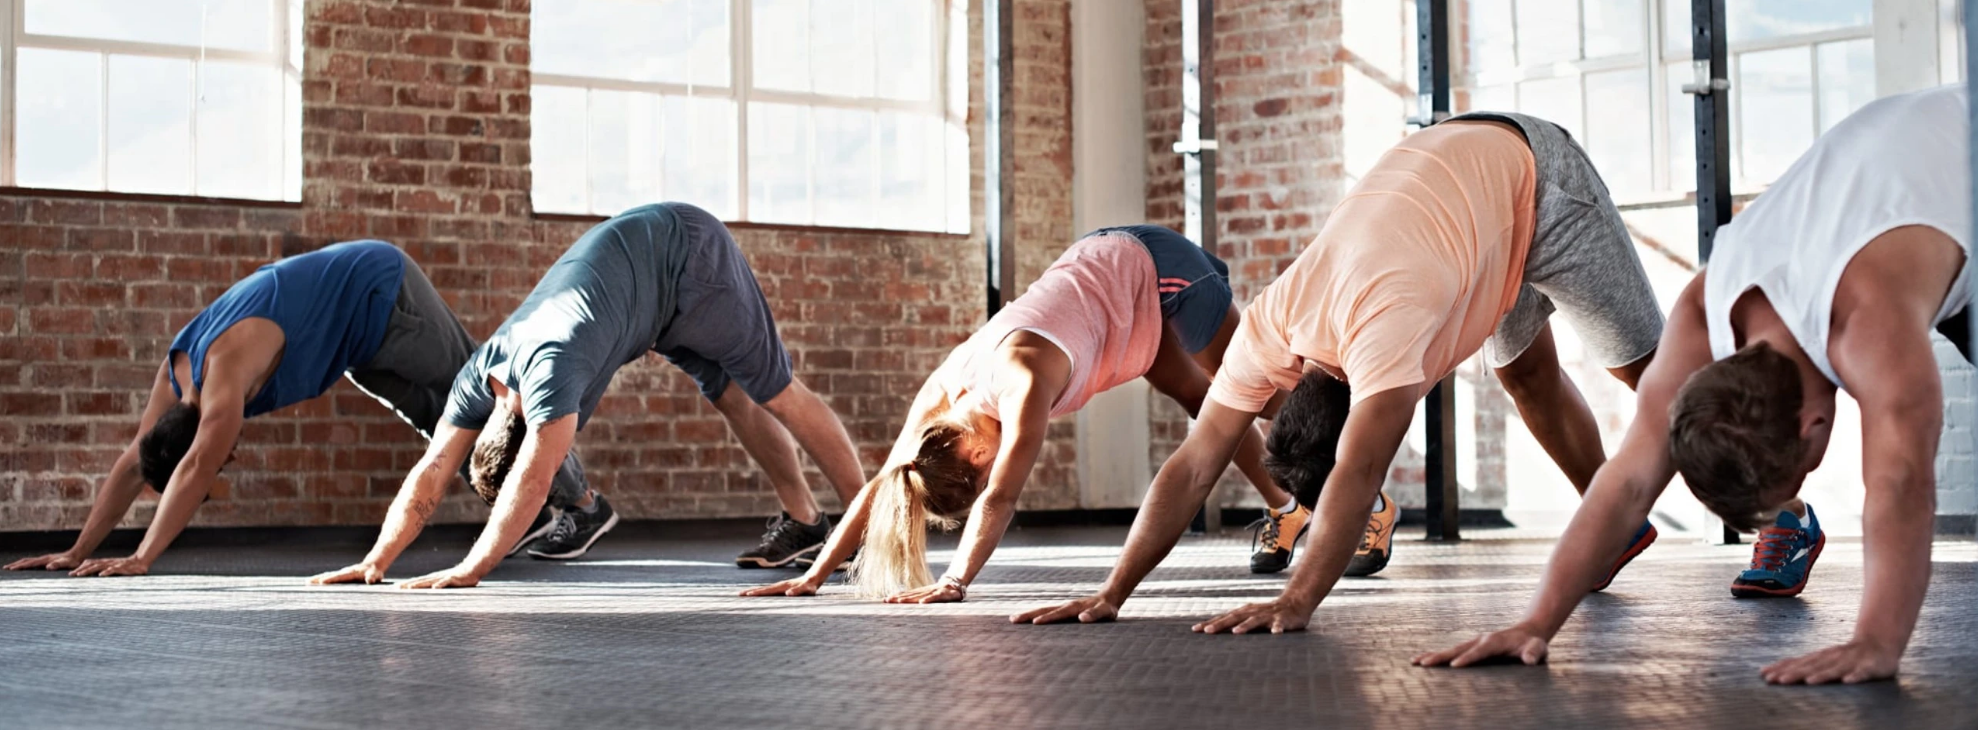 Online yoga at KGV?>